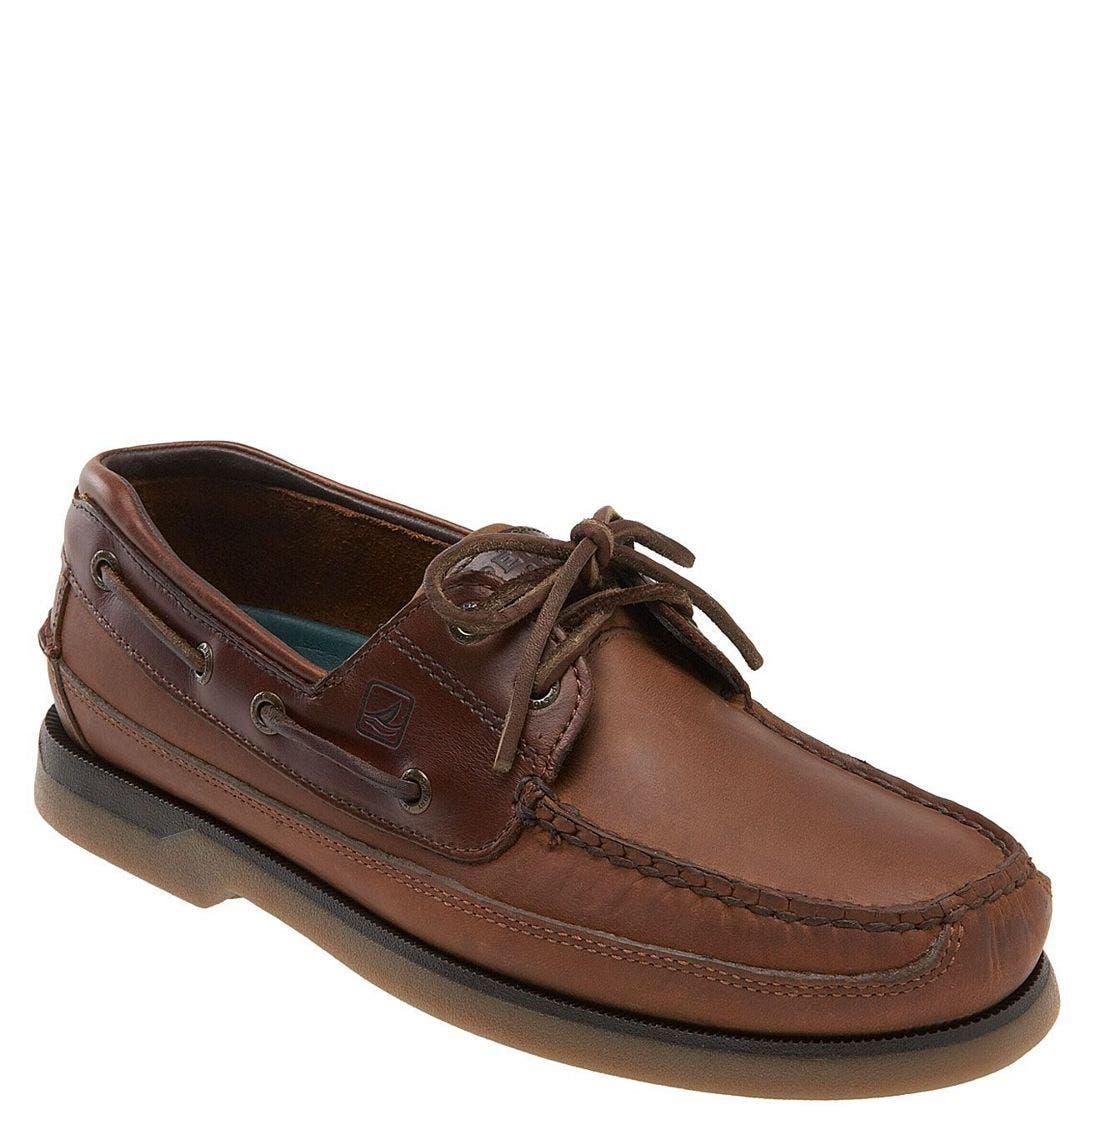 Top-Sider<sup>®</sup> 'Mako Two-Eye Canoe Moc' Boat Shoe,                         Main,                         color, COP